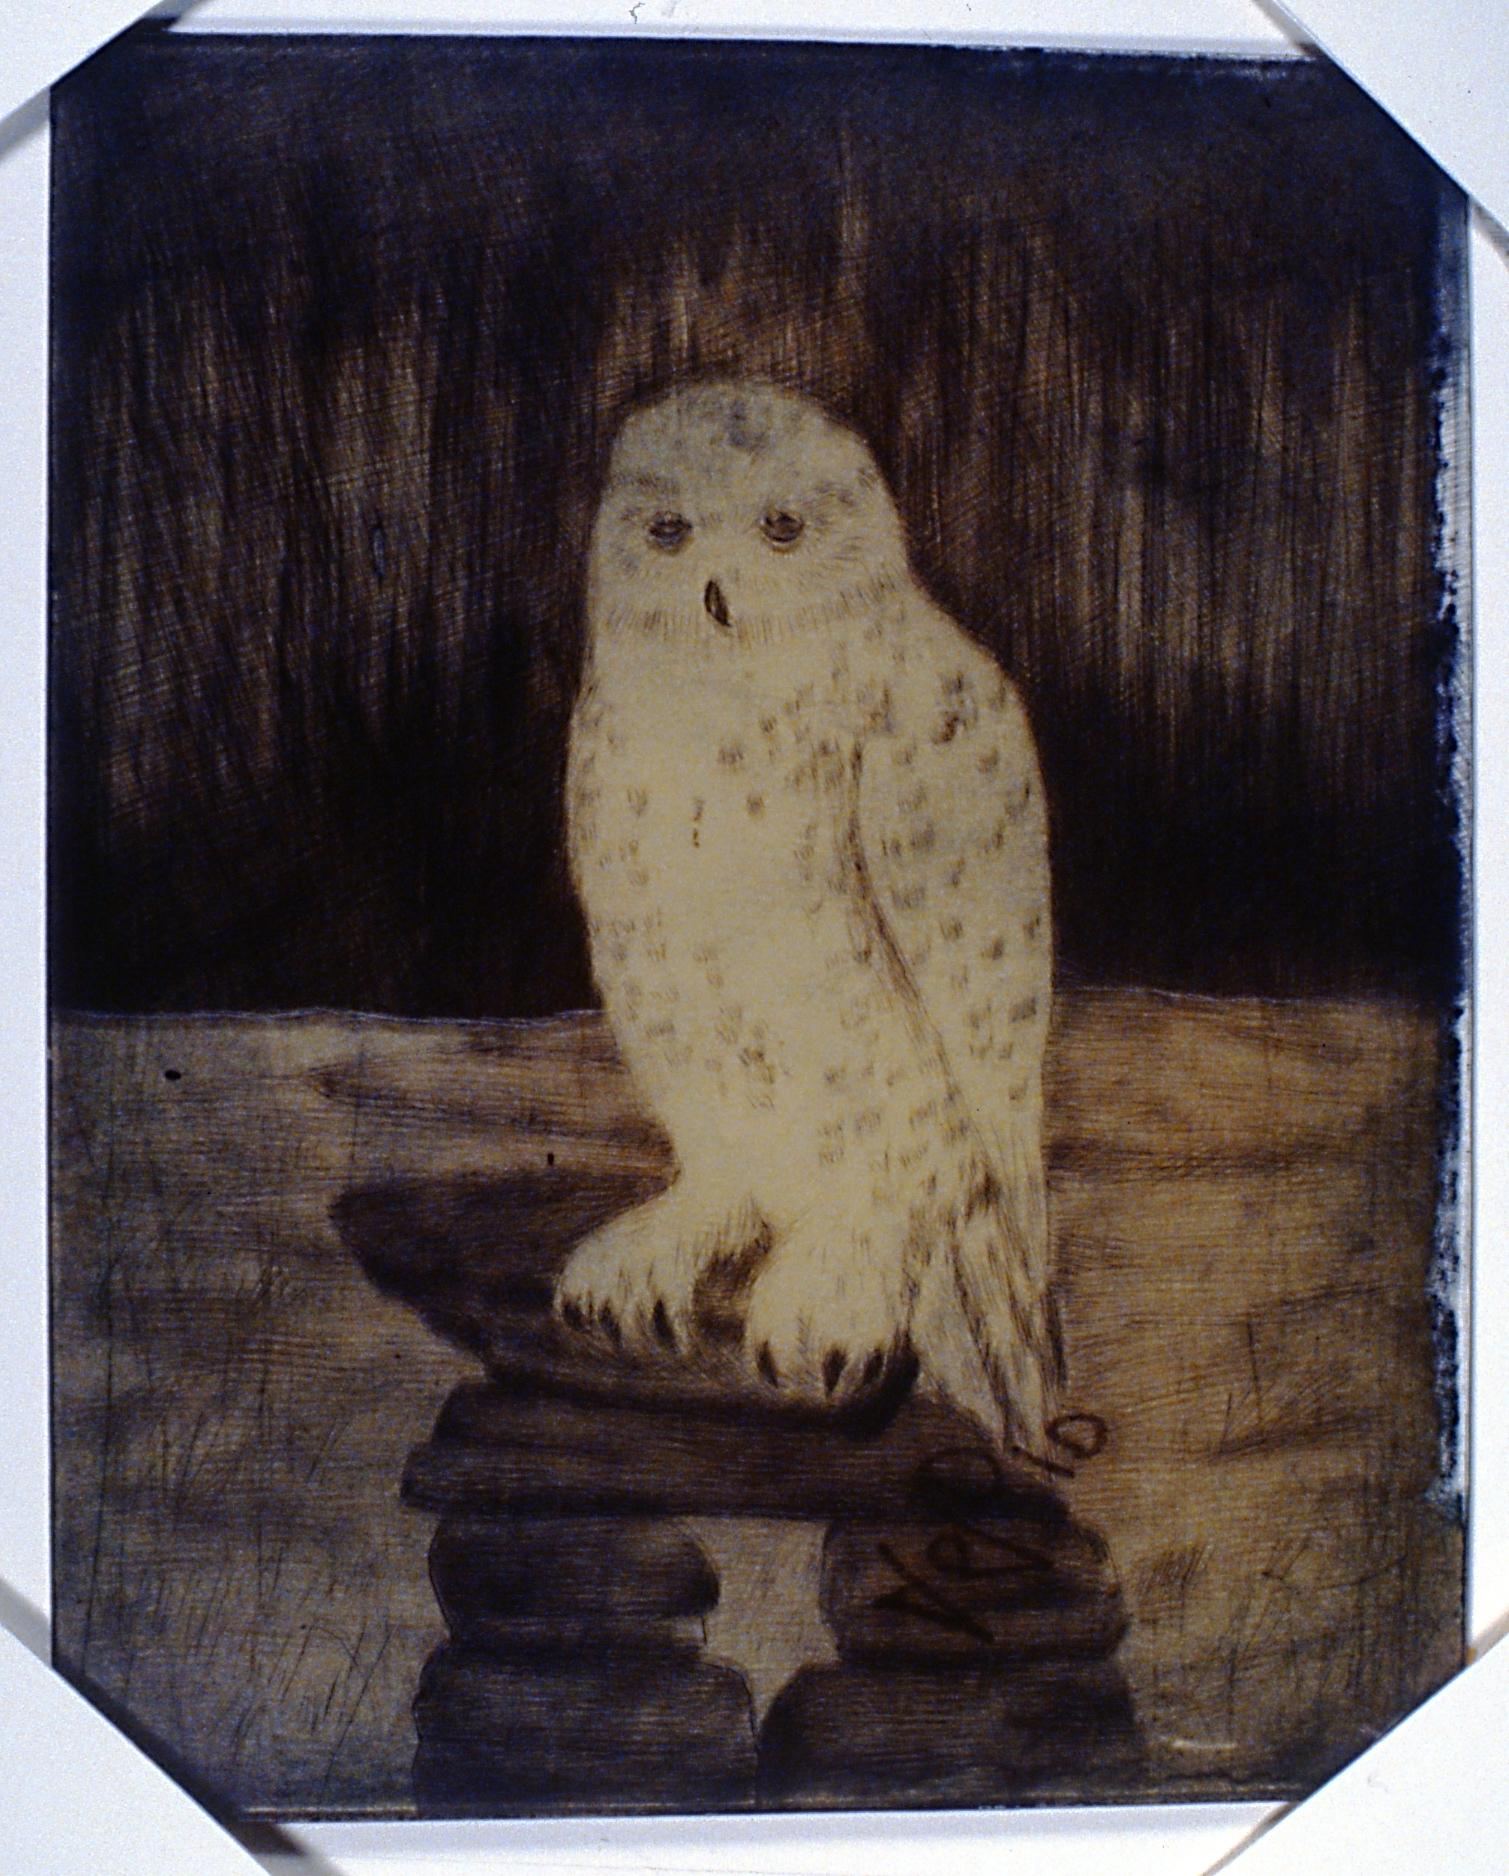 Snowy Owl , 1992, Minn Sjølseth, plastic etching plate, 30 x 24cm, 1996.02.02